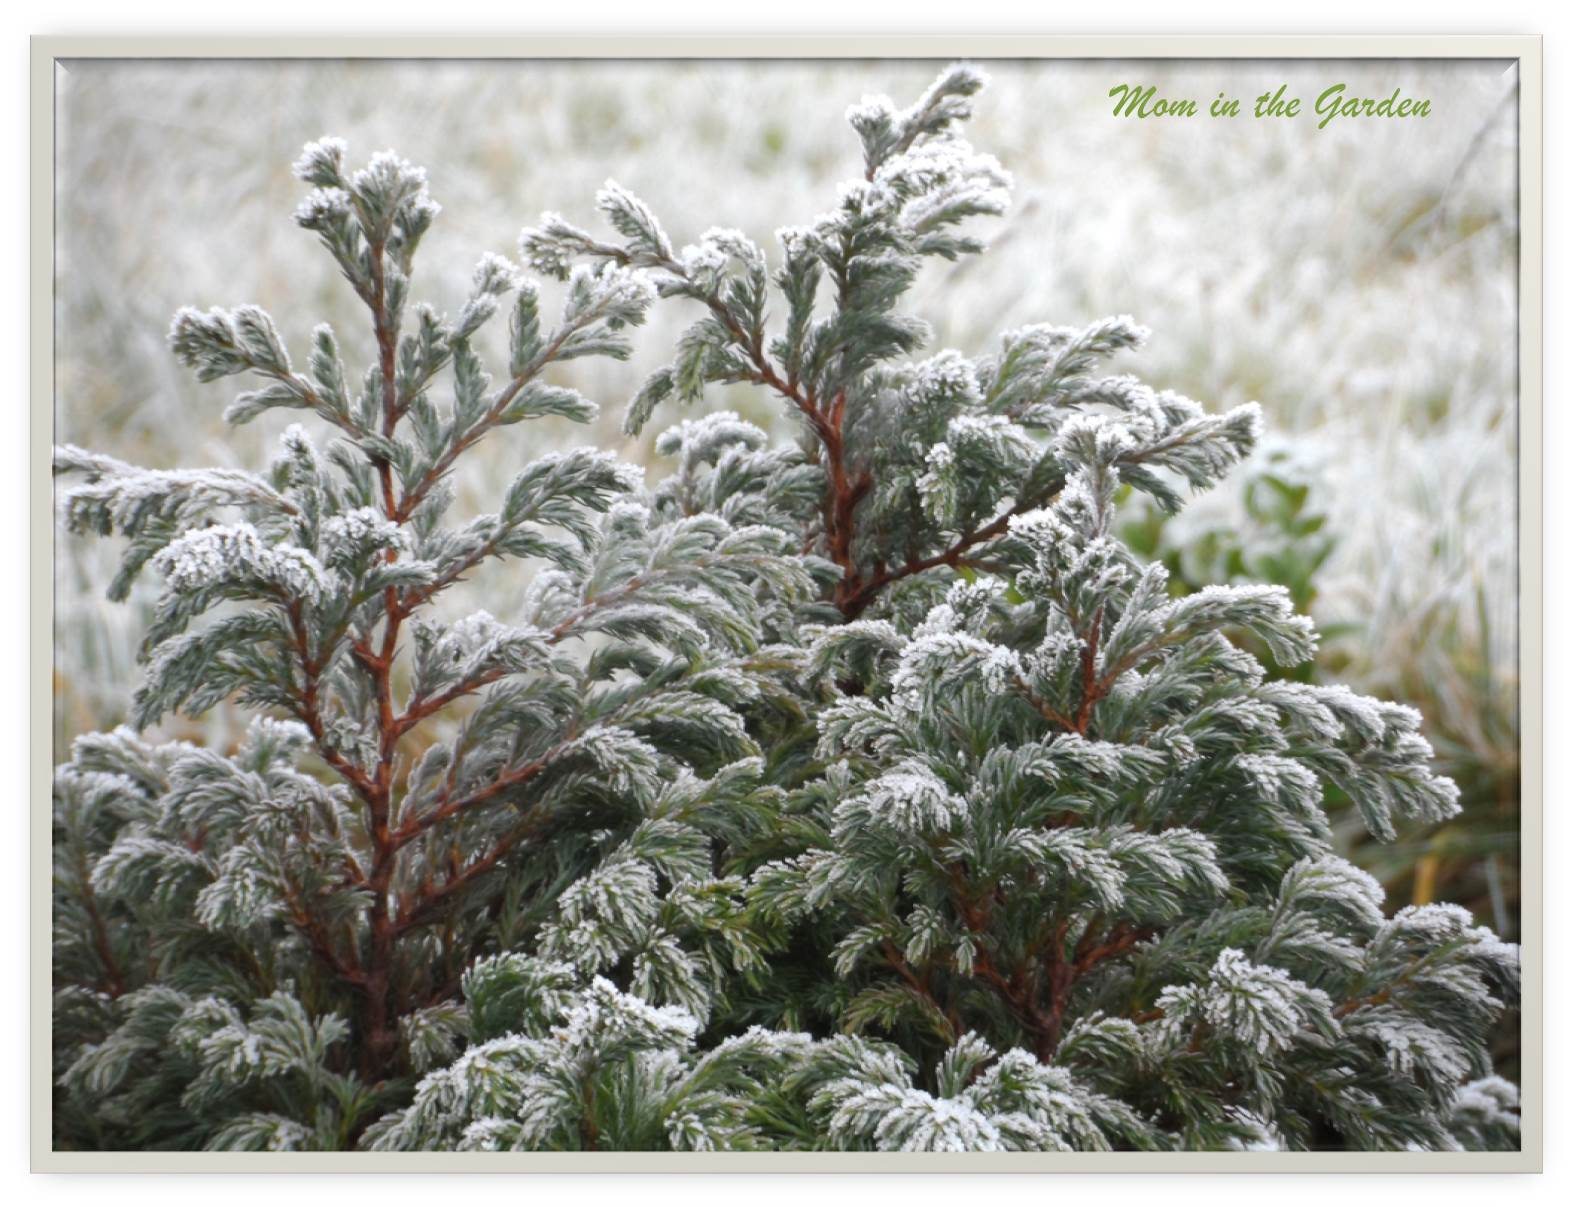 Frosty evergreen